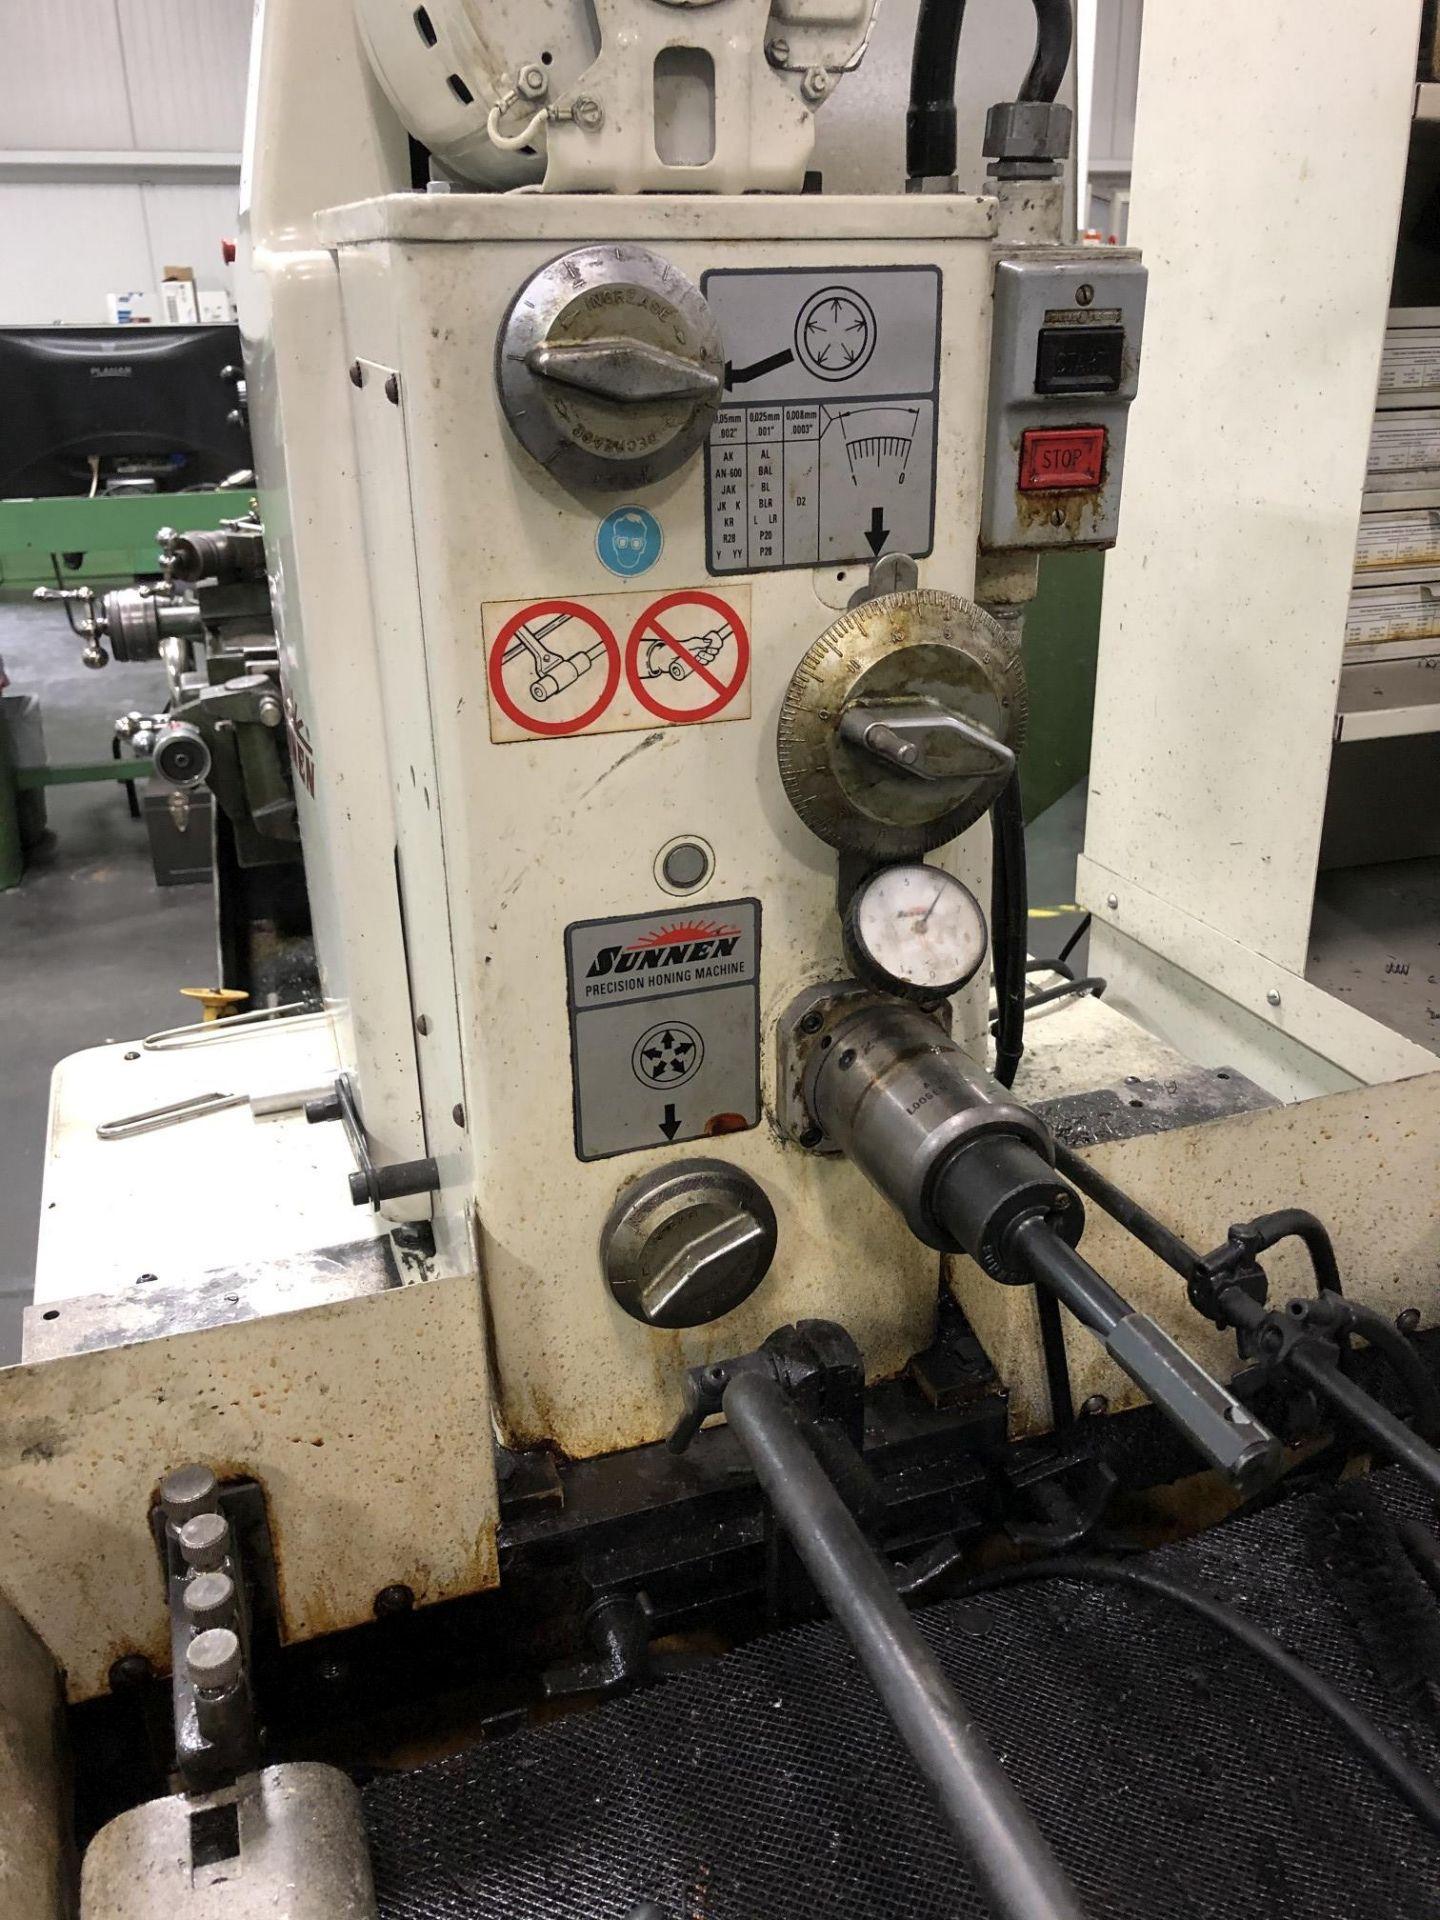 Sunnen MBB-1660 Precision Honing Machine - Image 4 of 8